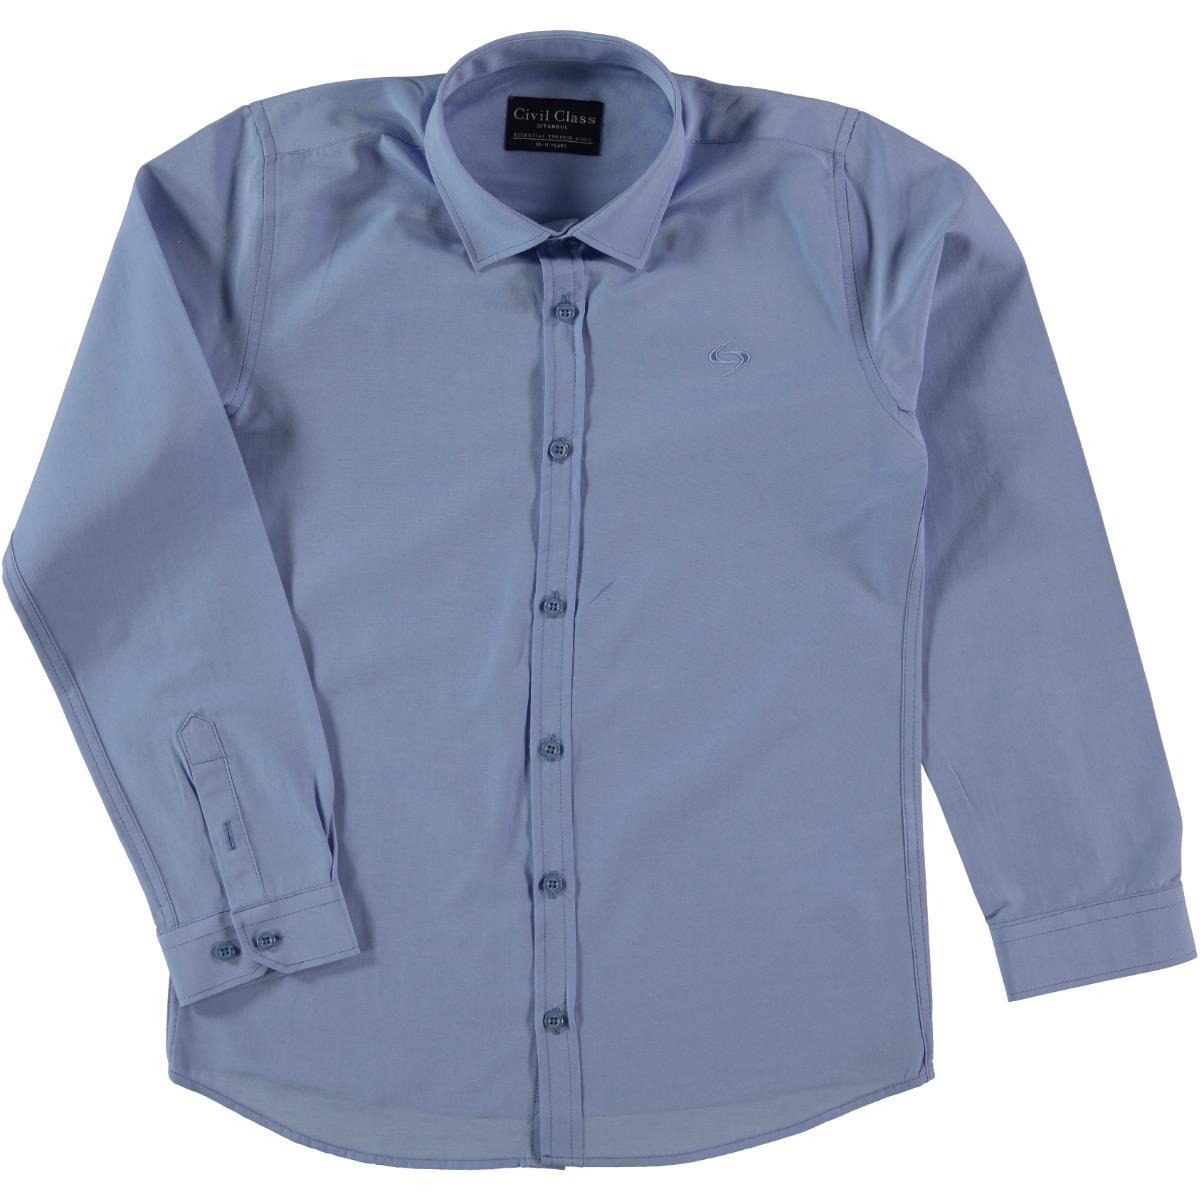 Civil Class Blue Shirt Boy Age 10-13